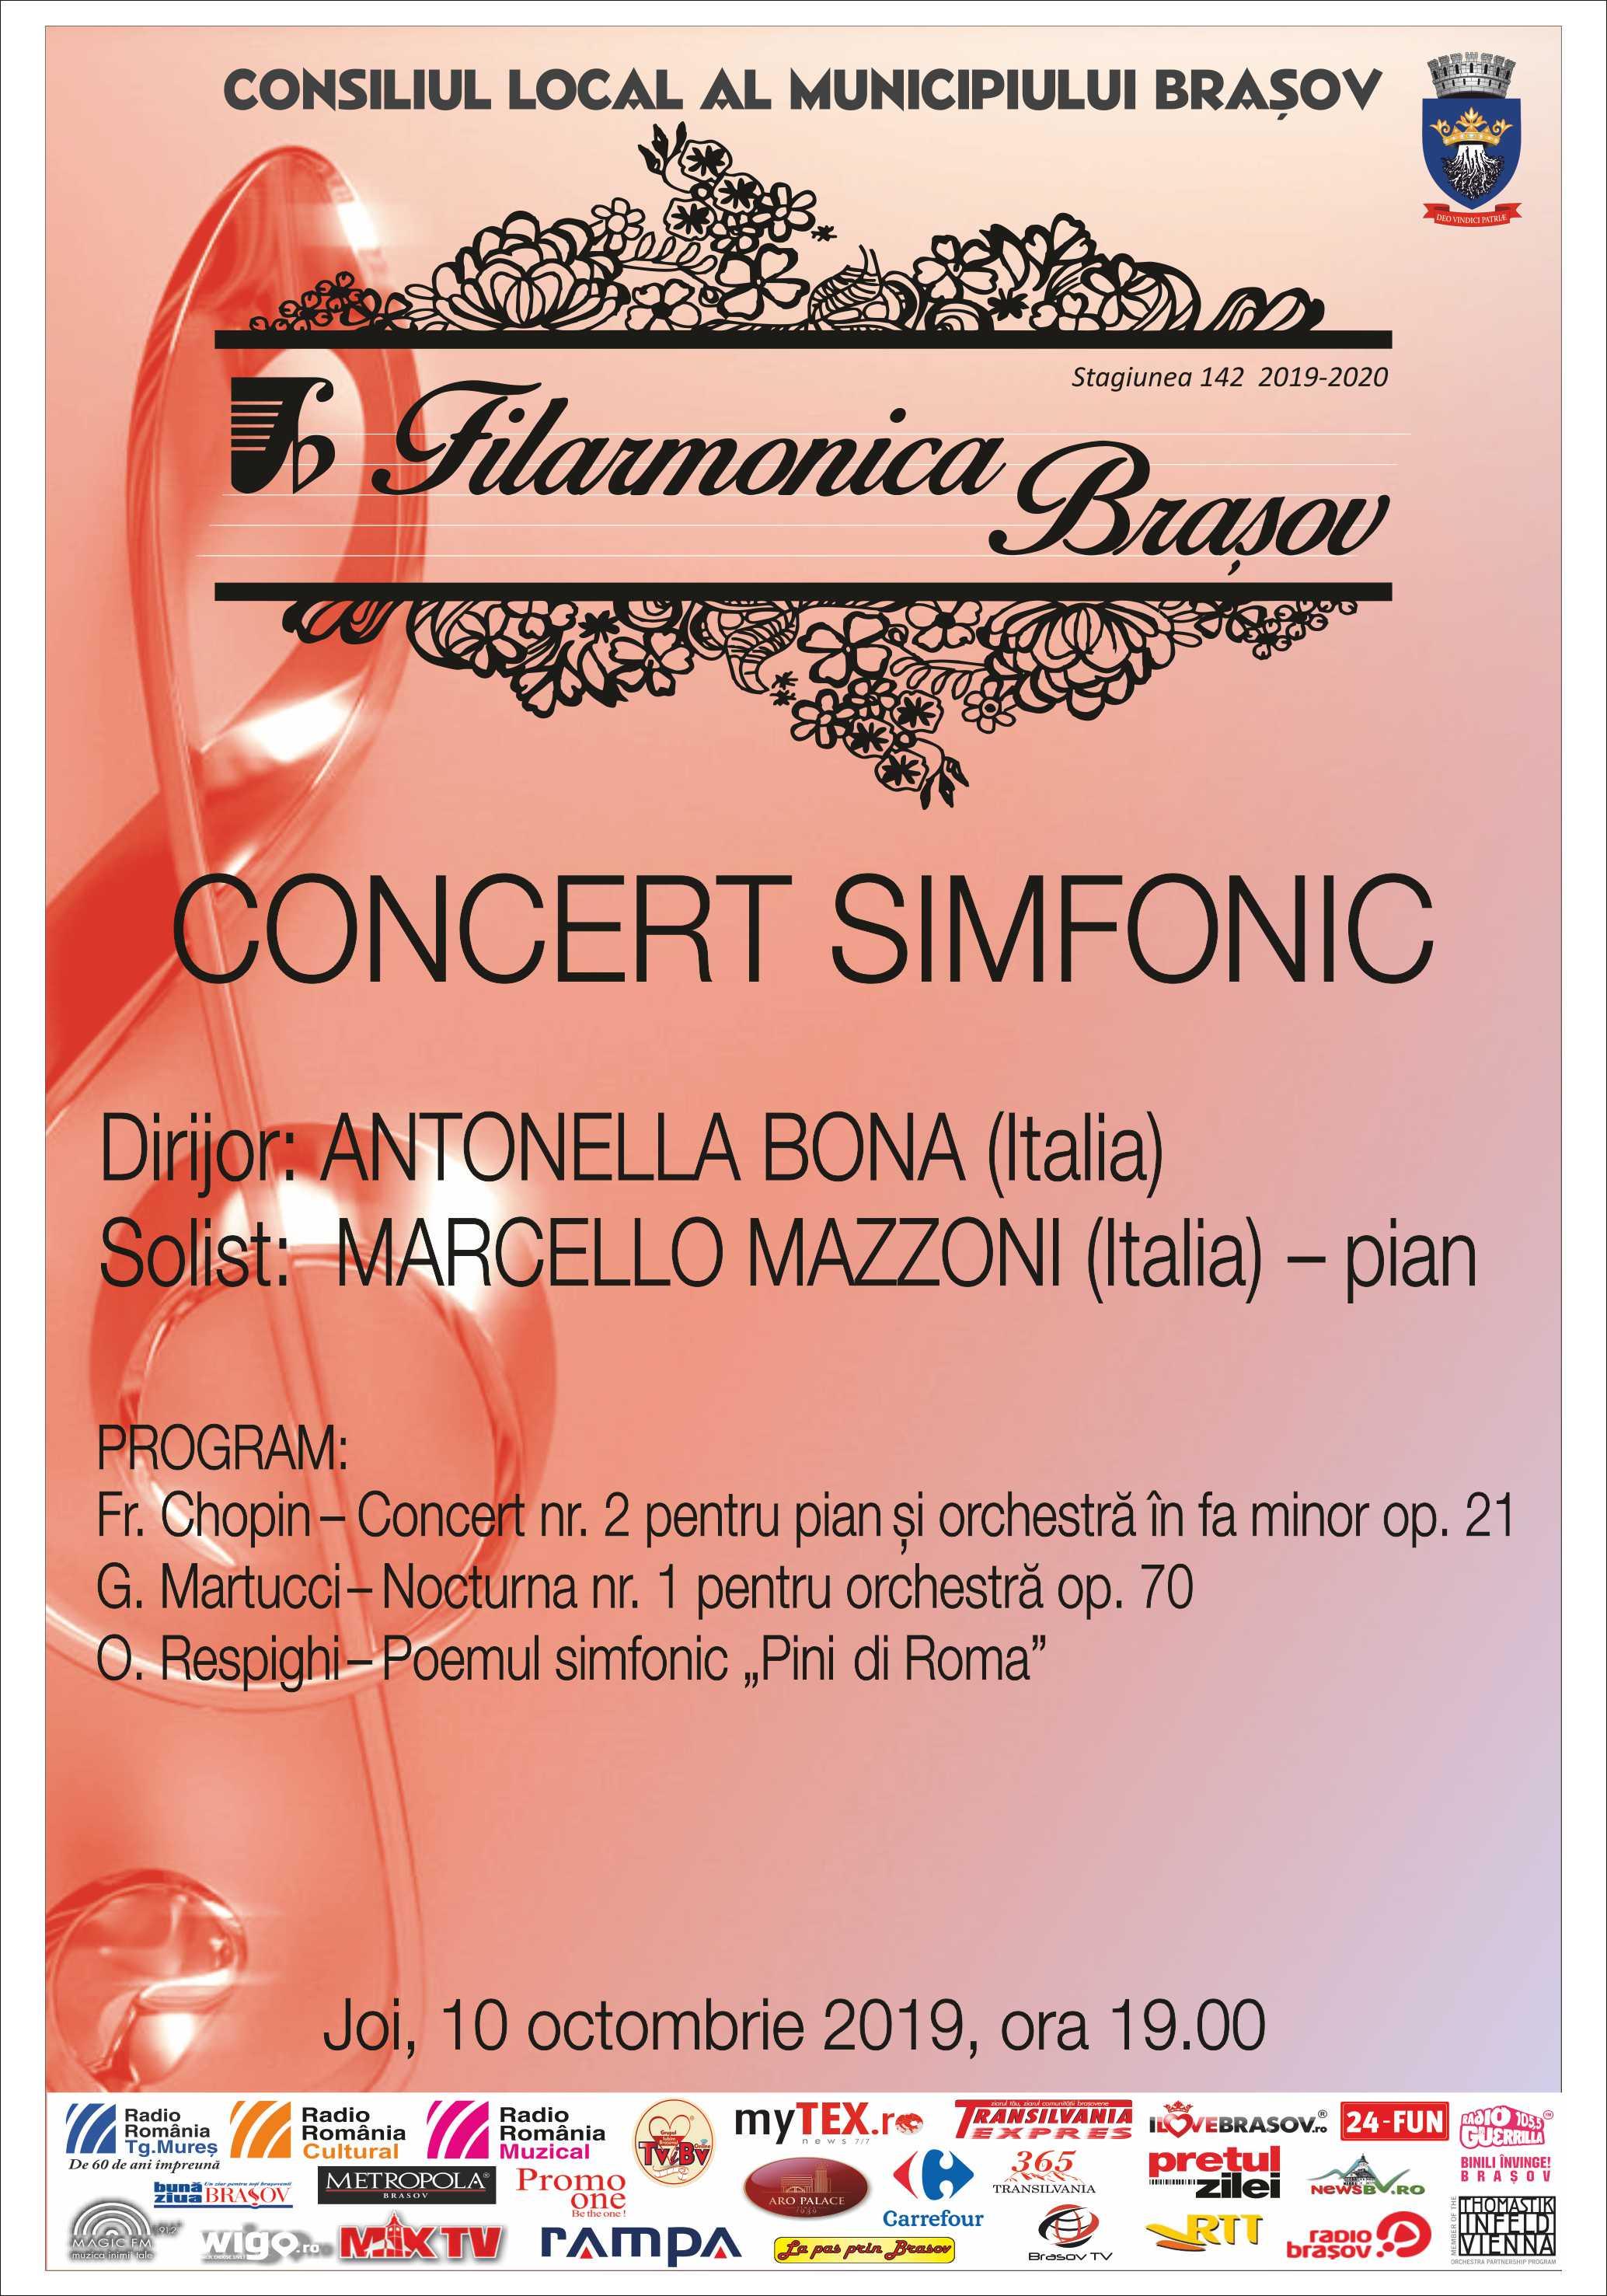 CONCERT SIMFONIC | Filarmonica Brasov